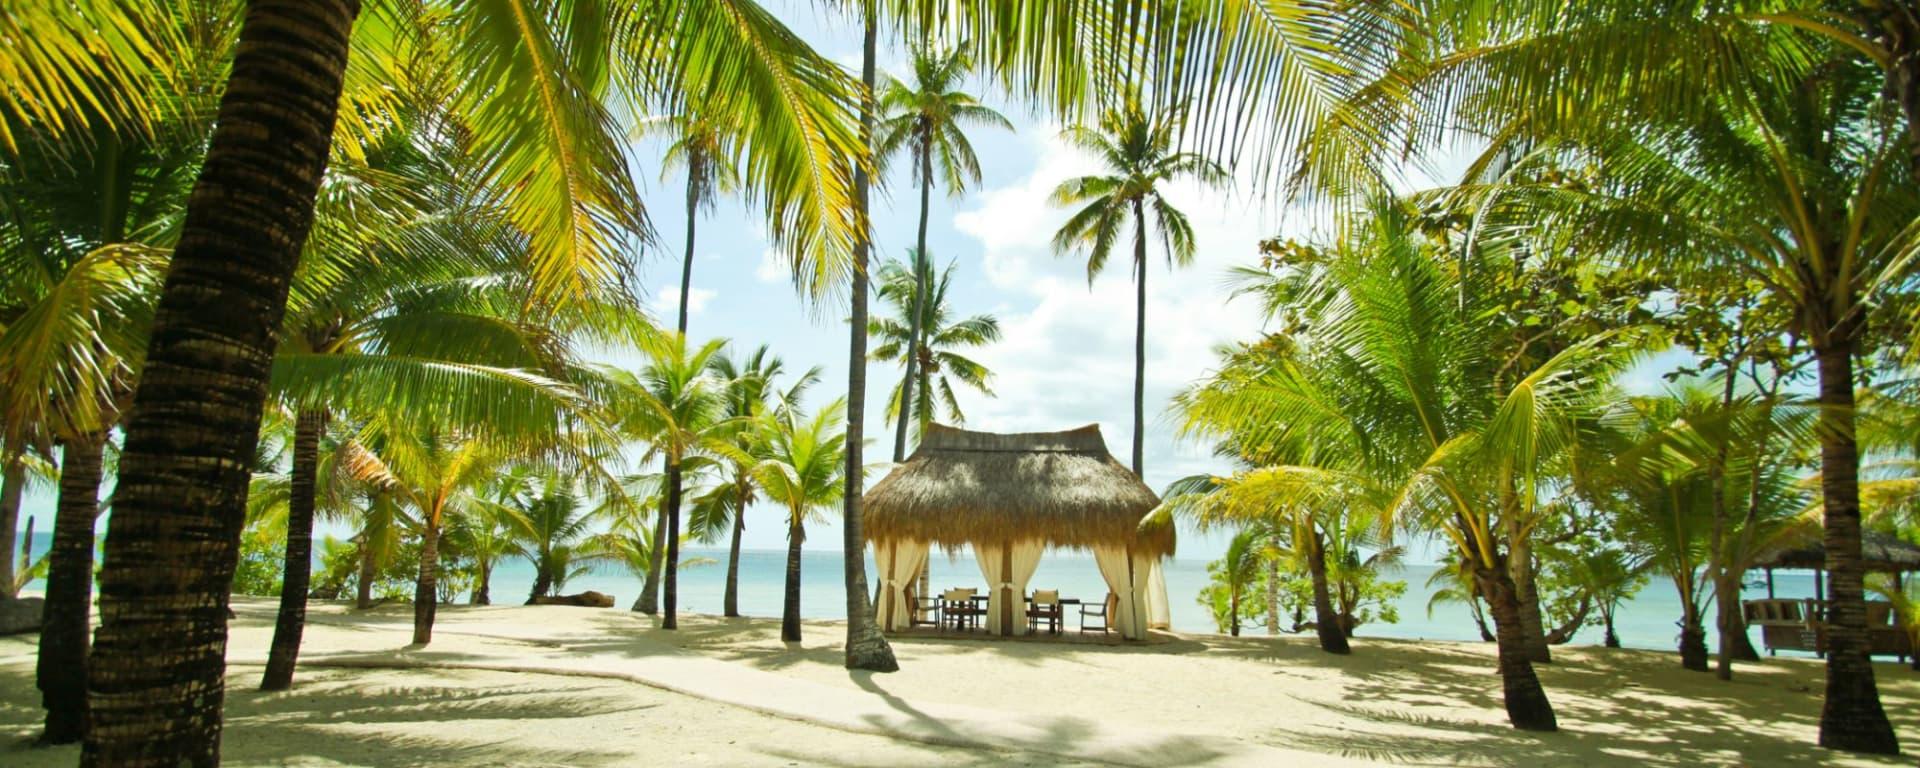 Coco Grove Beach Resort in Siquijor: Beach Side Nipa Hut